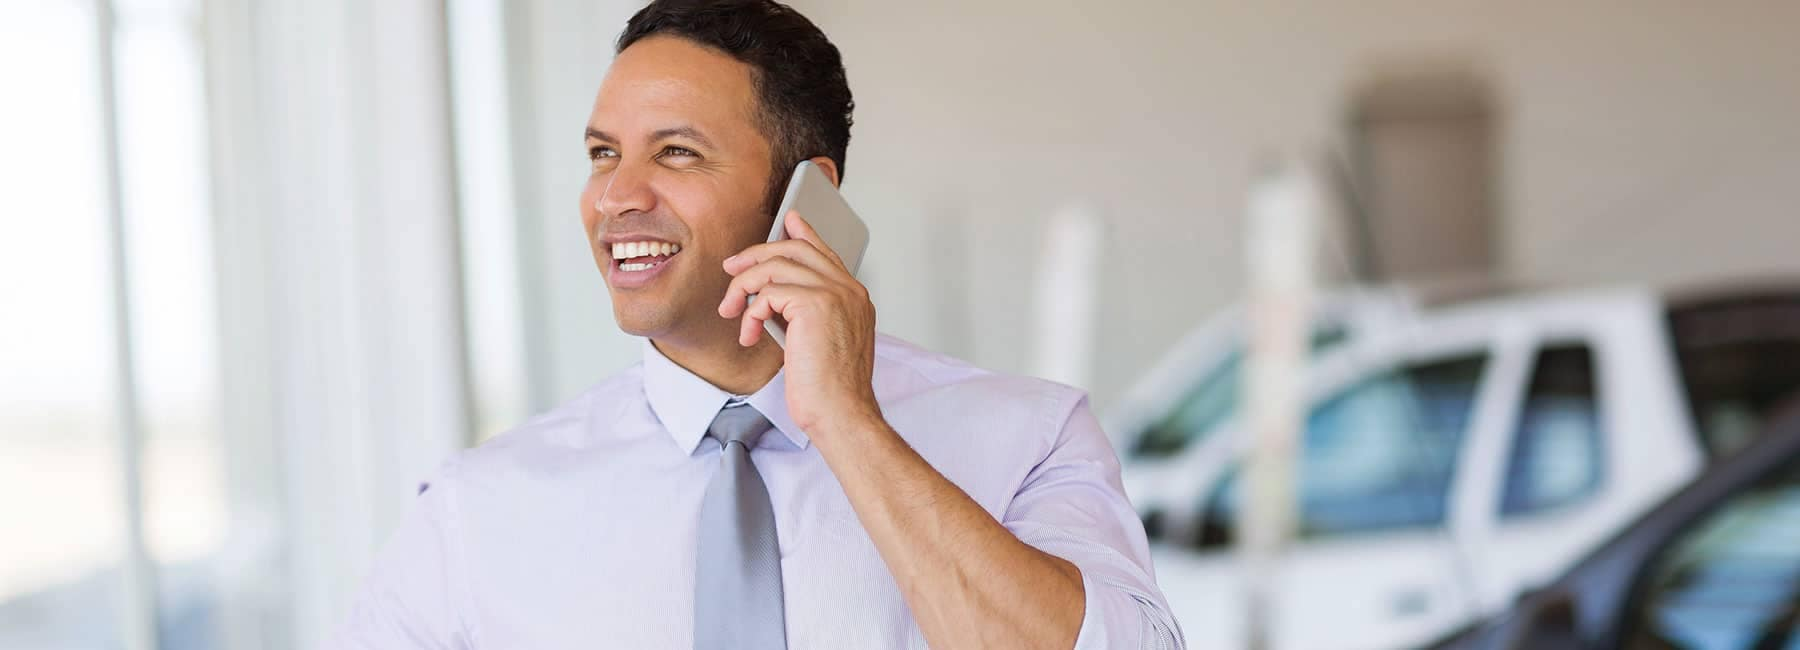 Contact Us - Dealership